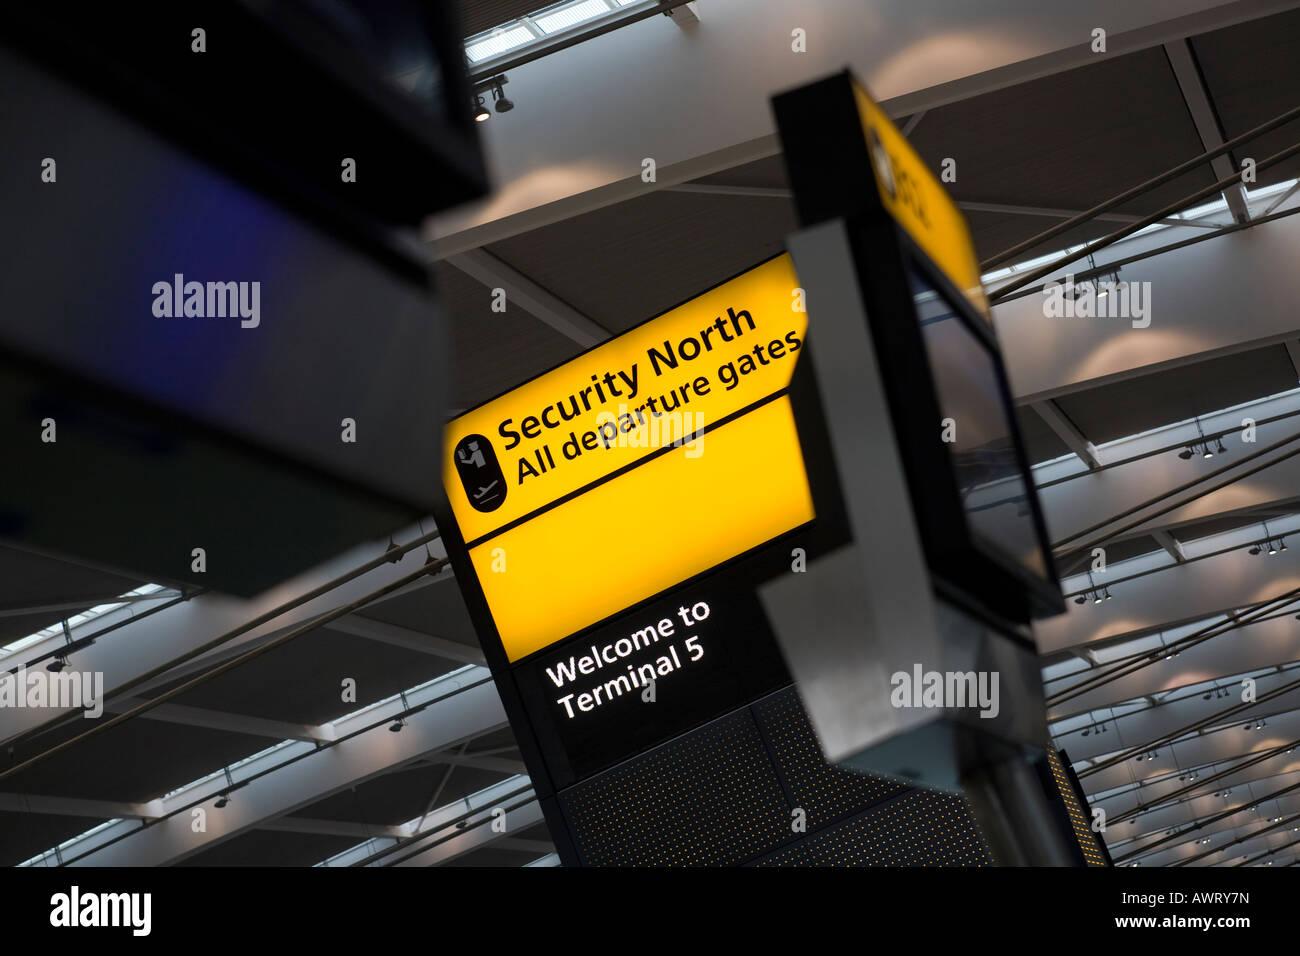 Security Notice display at London Heathrow Airport Terminal 5 Stock Photo